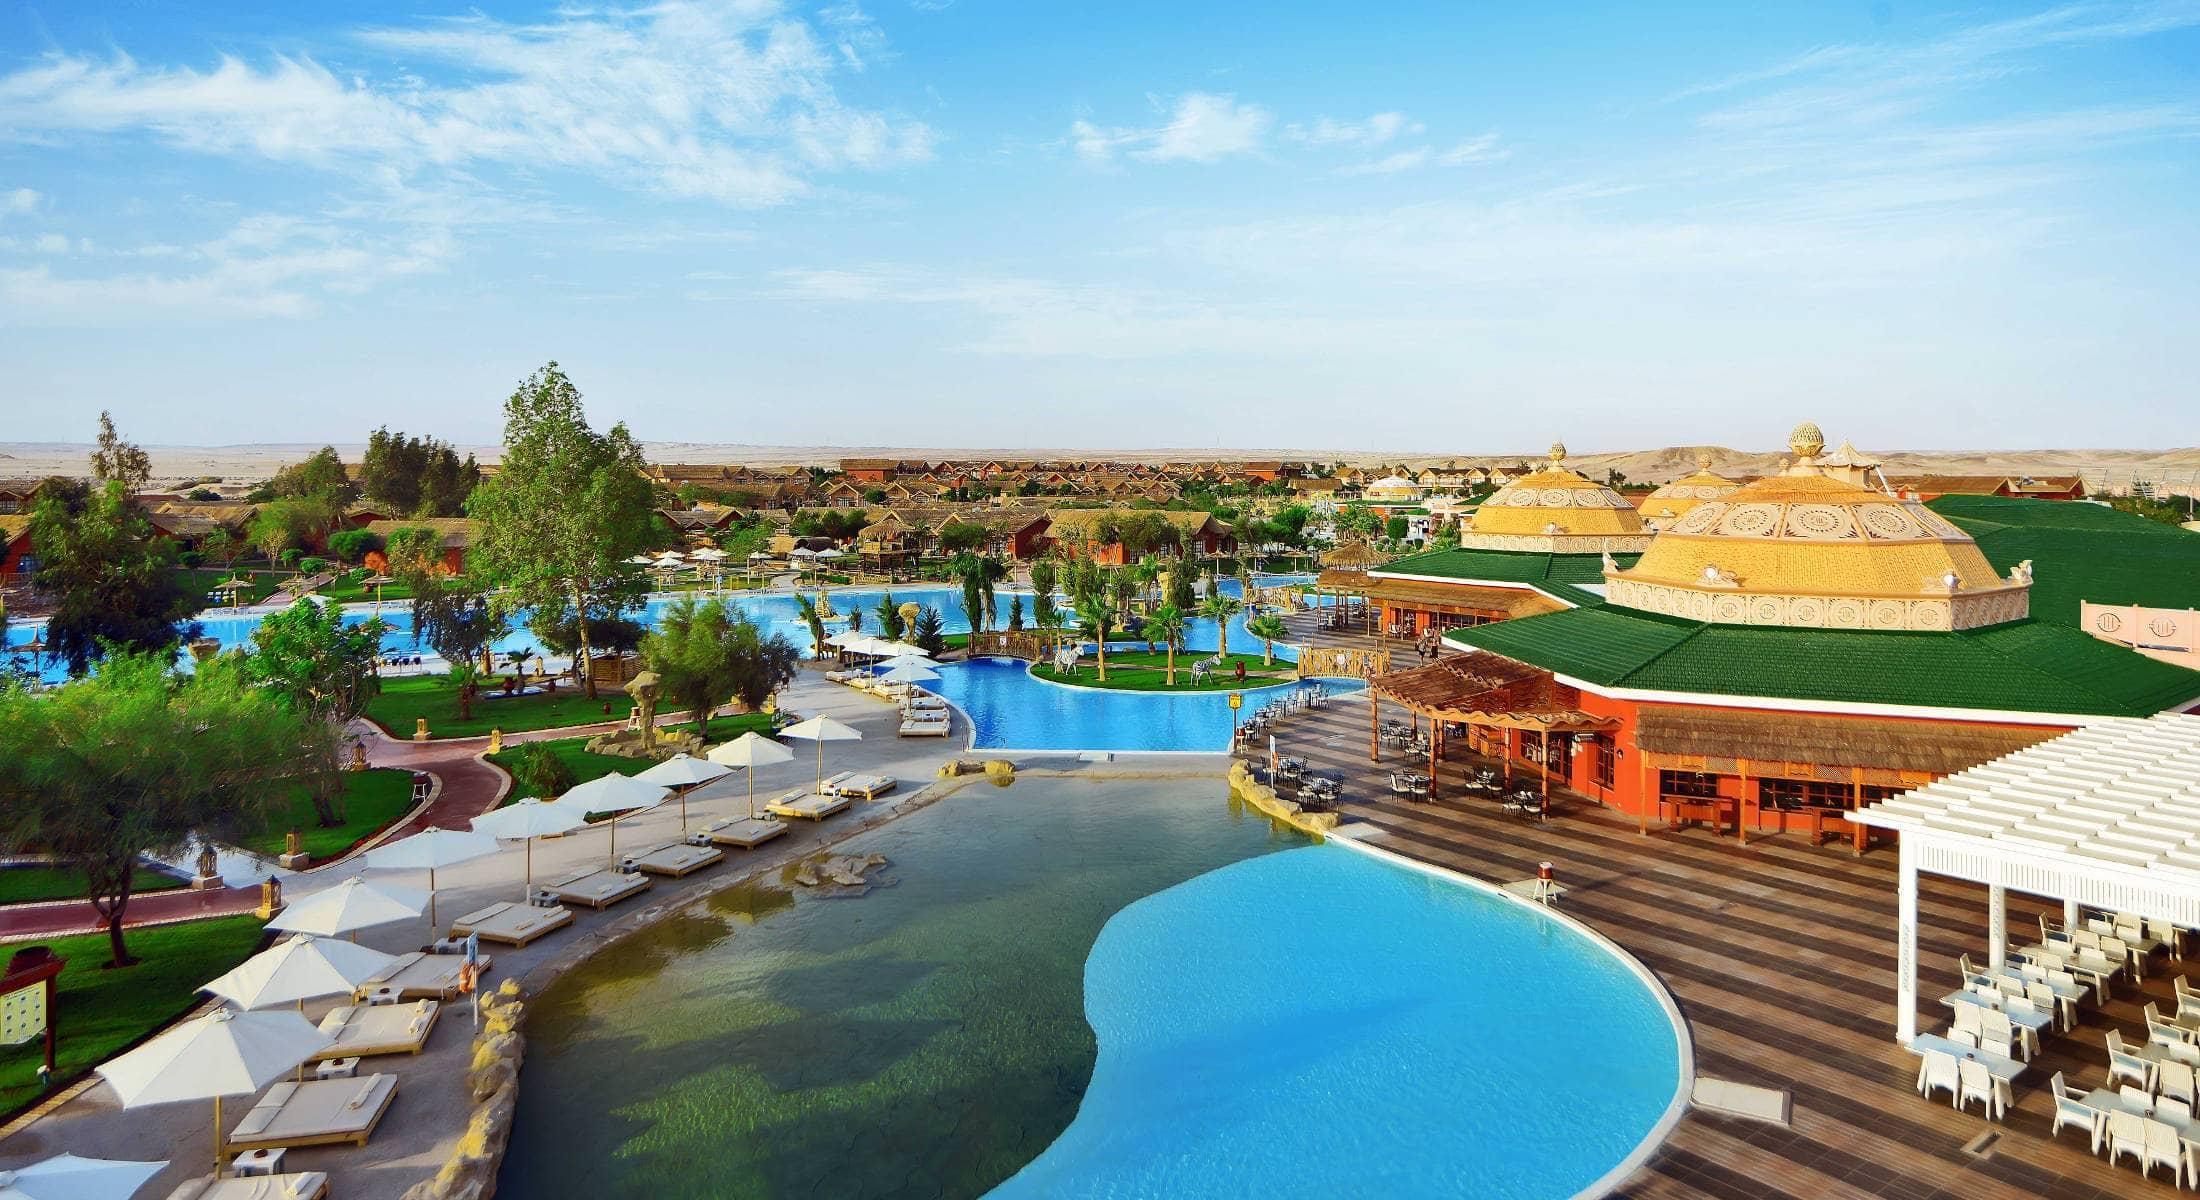 Pickalbatros Hotels & Resort  Discover Our 12 Hotels In. Aqua Montagut Hotel. Hotel Palomar. Glenalmond House. Villa Marija. Dreams Patagonia Hotel. Grand Hotel DAragona. The Nautilus Hotel. Hilton Luxor Resort & Spa